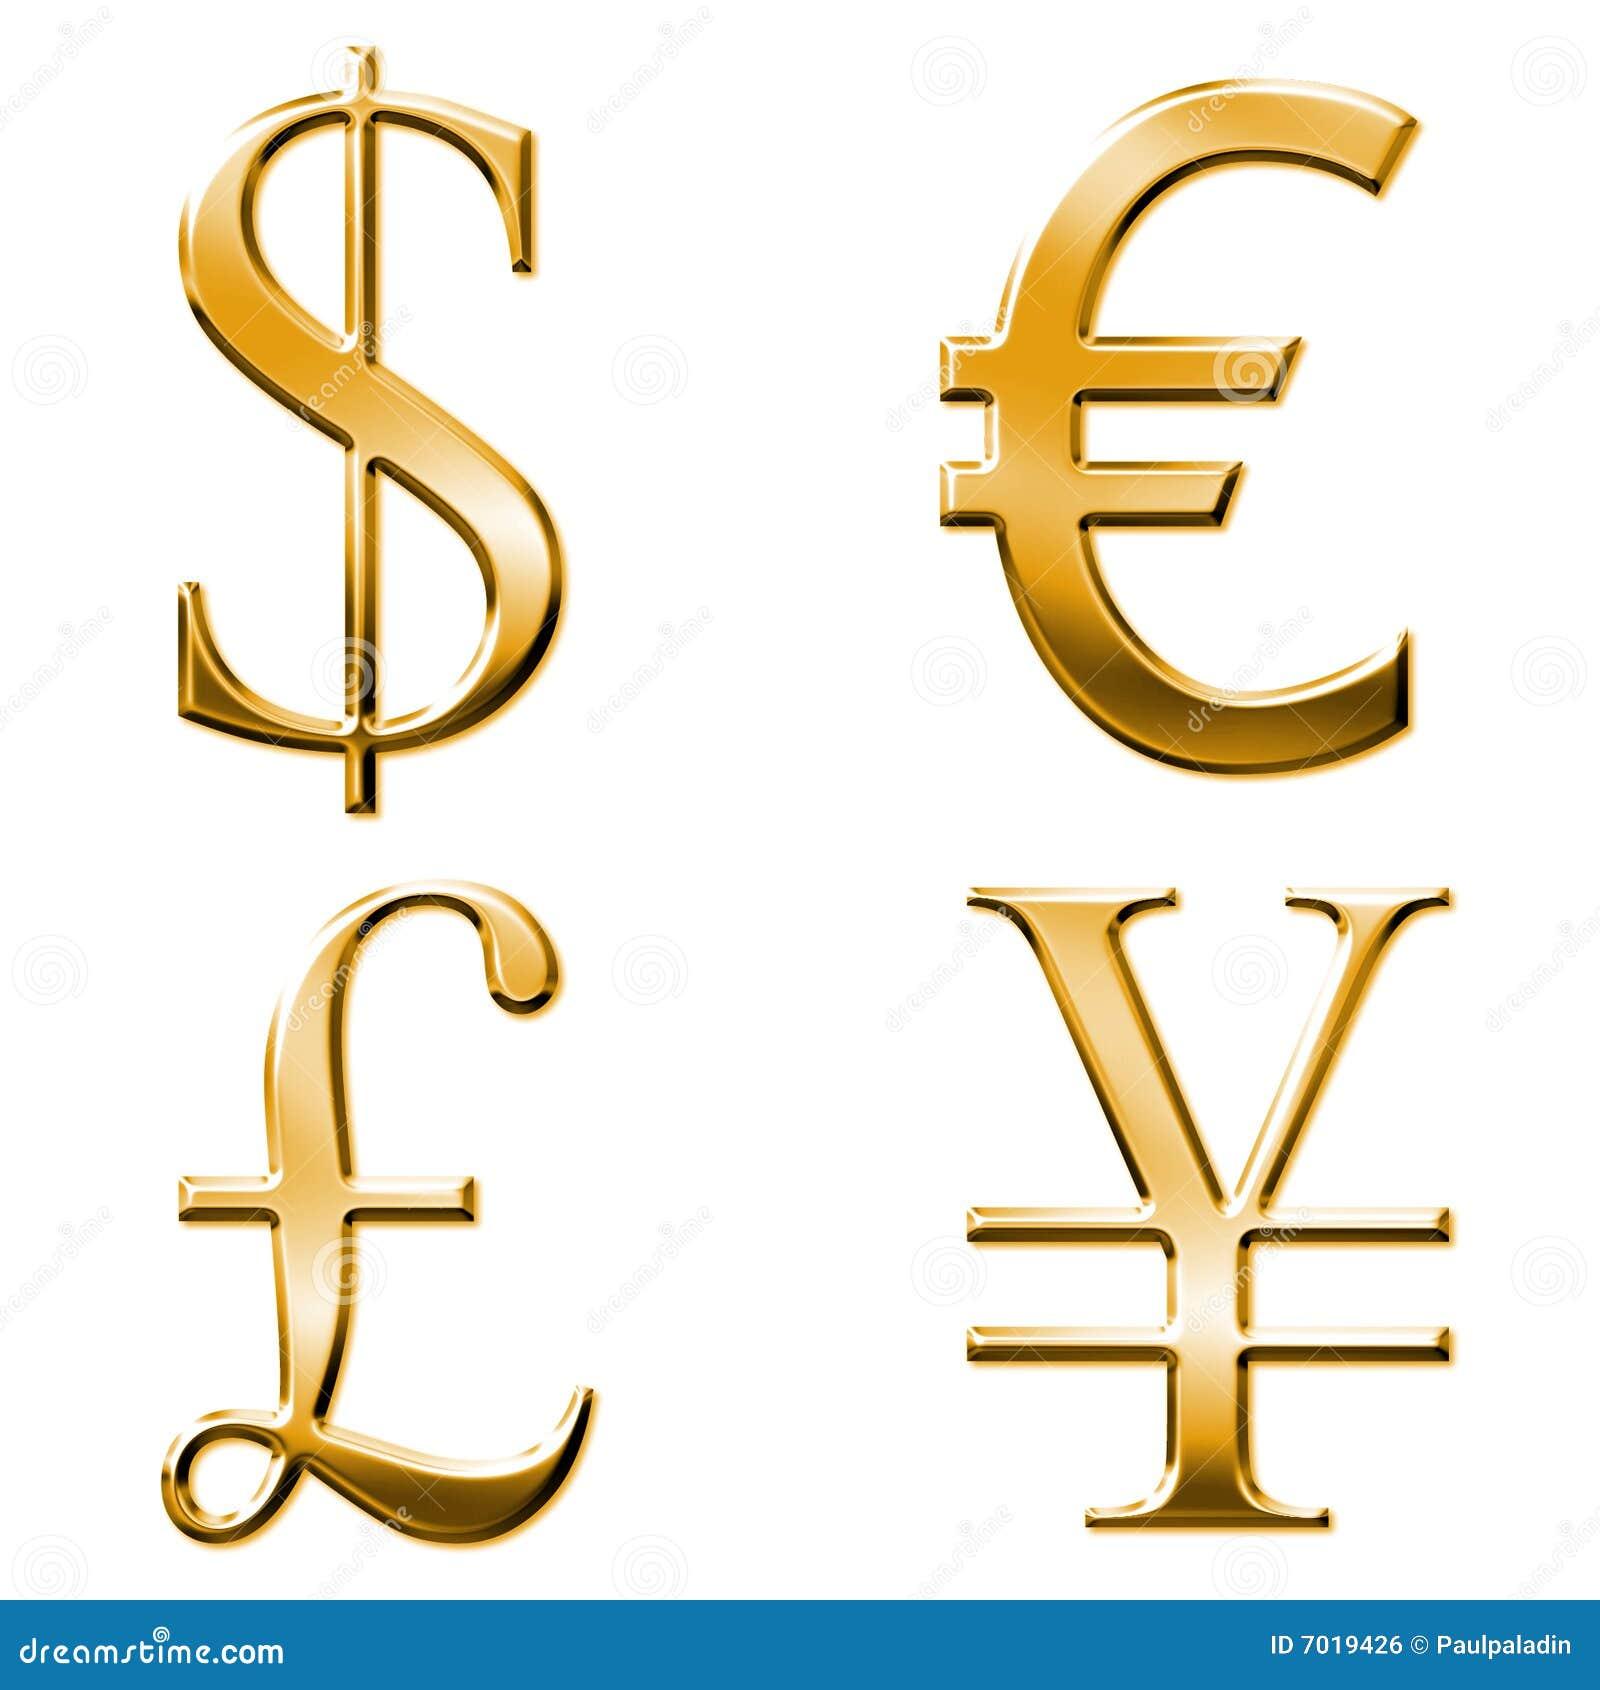 Eur dollar yen pound symbols stock illustration illustration eur dollar yen pound symbols royalty free stock image biocorpaavc Gallery